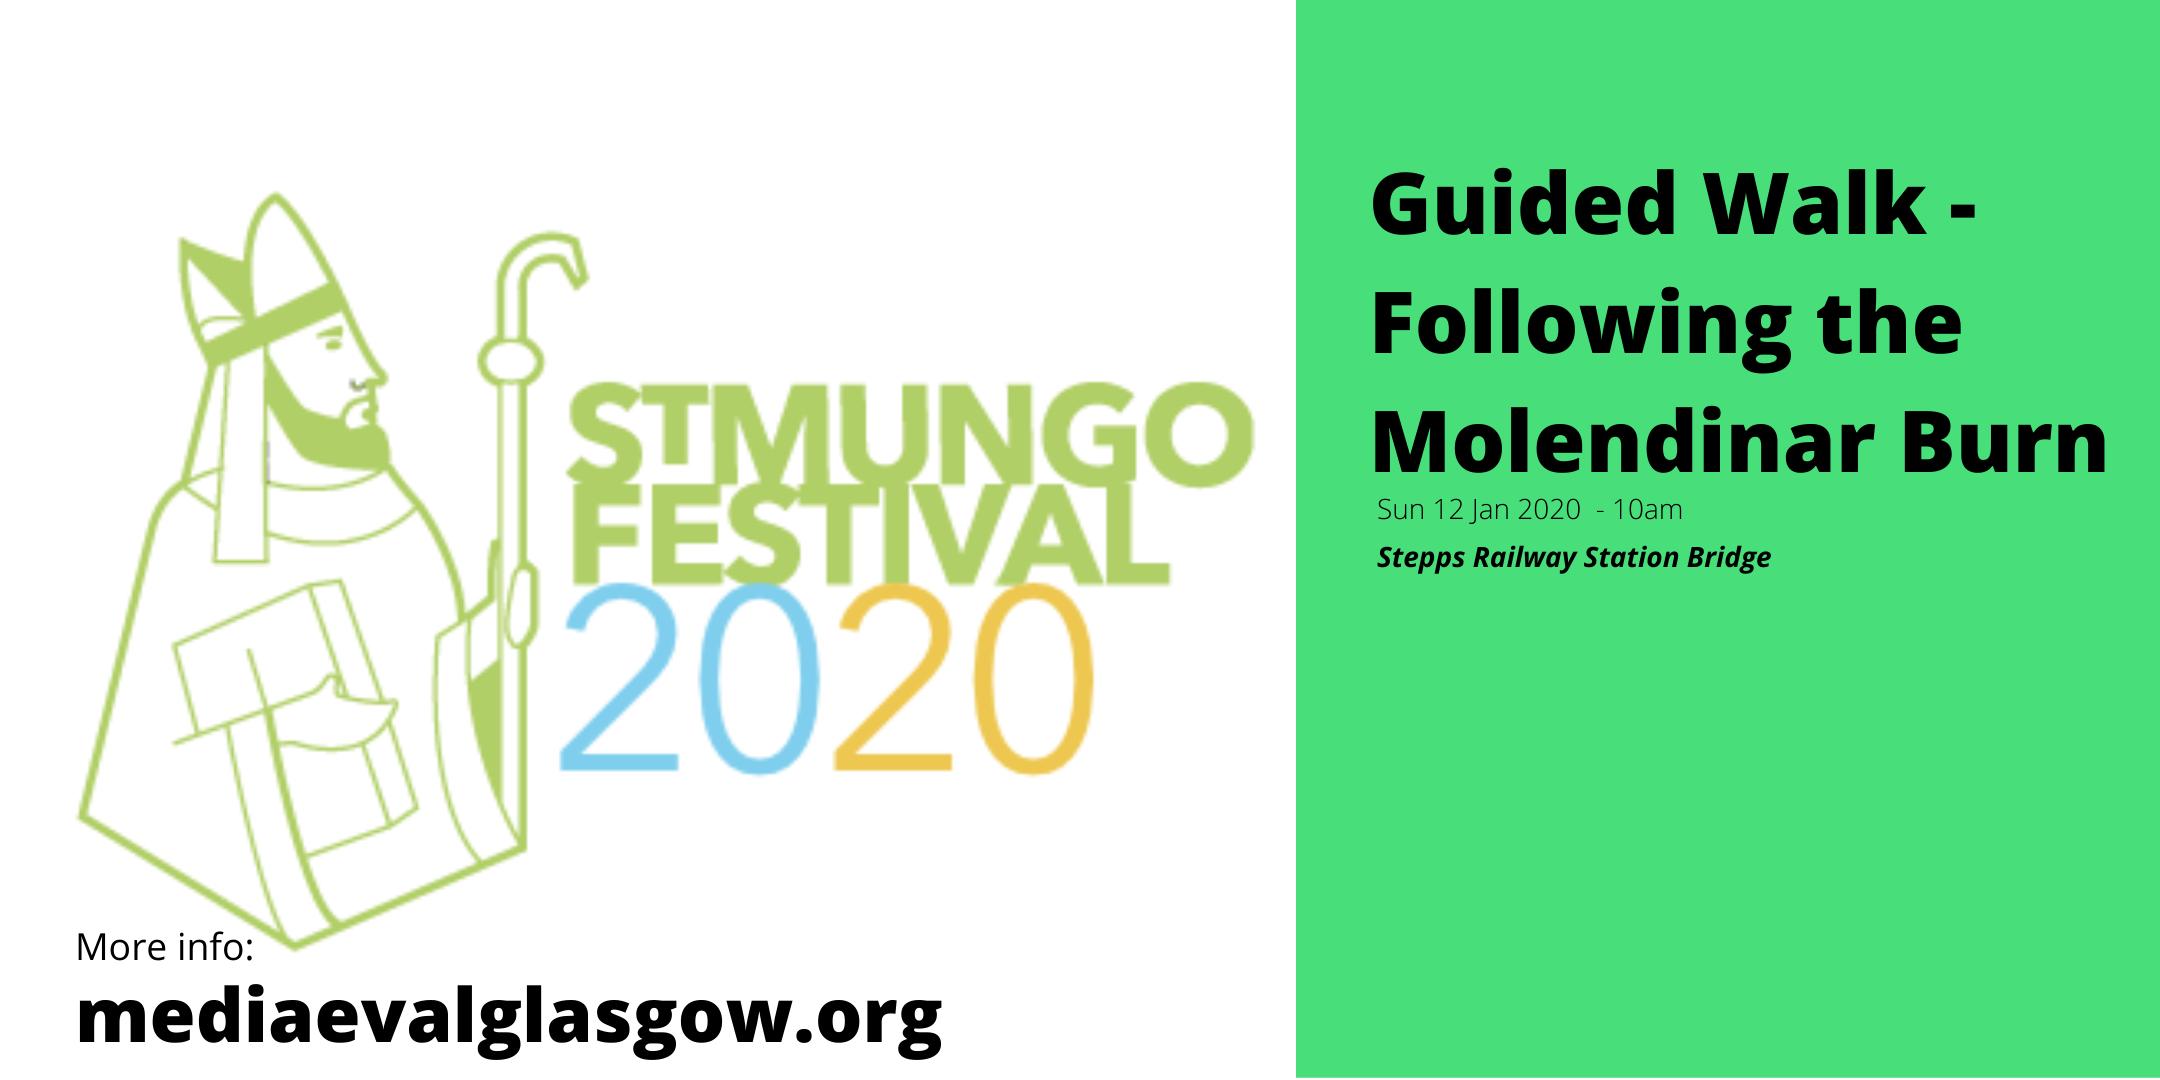 St Mungo 2020 - FEAST OF St MUNGO